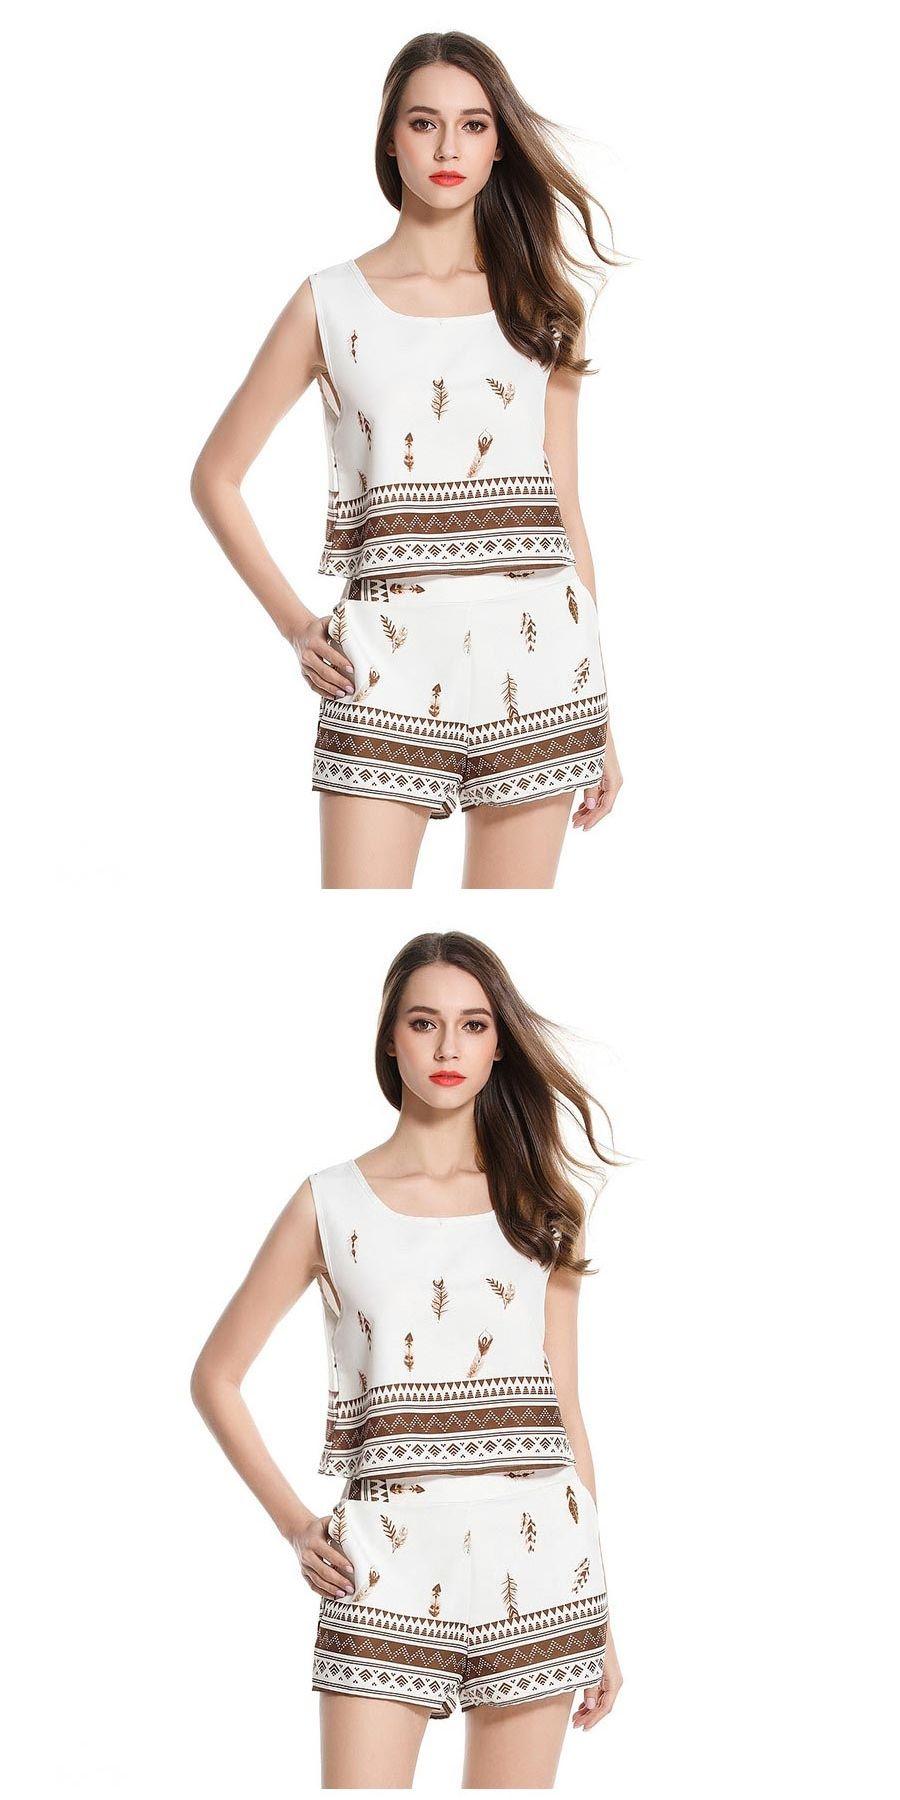 34aec0b18e3e Discover ideas about Short Set. IMC Women's New Fashion Print O Neck Crop  Tops Female Shorts Two Piece Set Summer ...